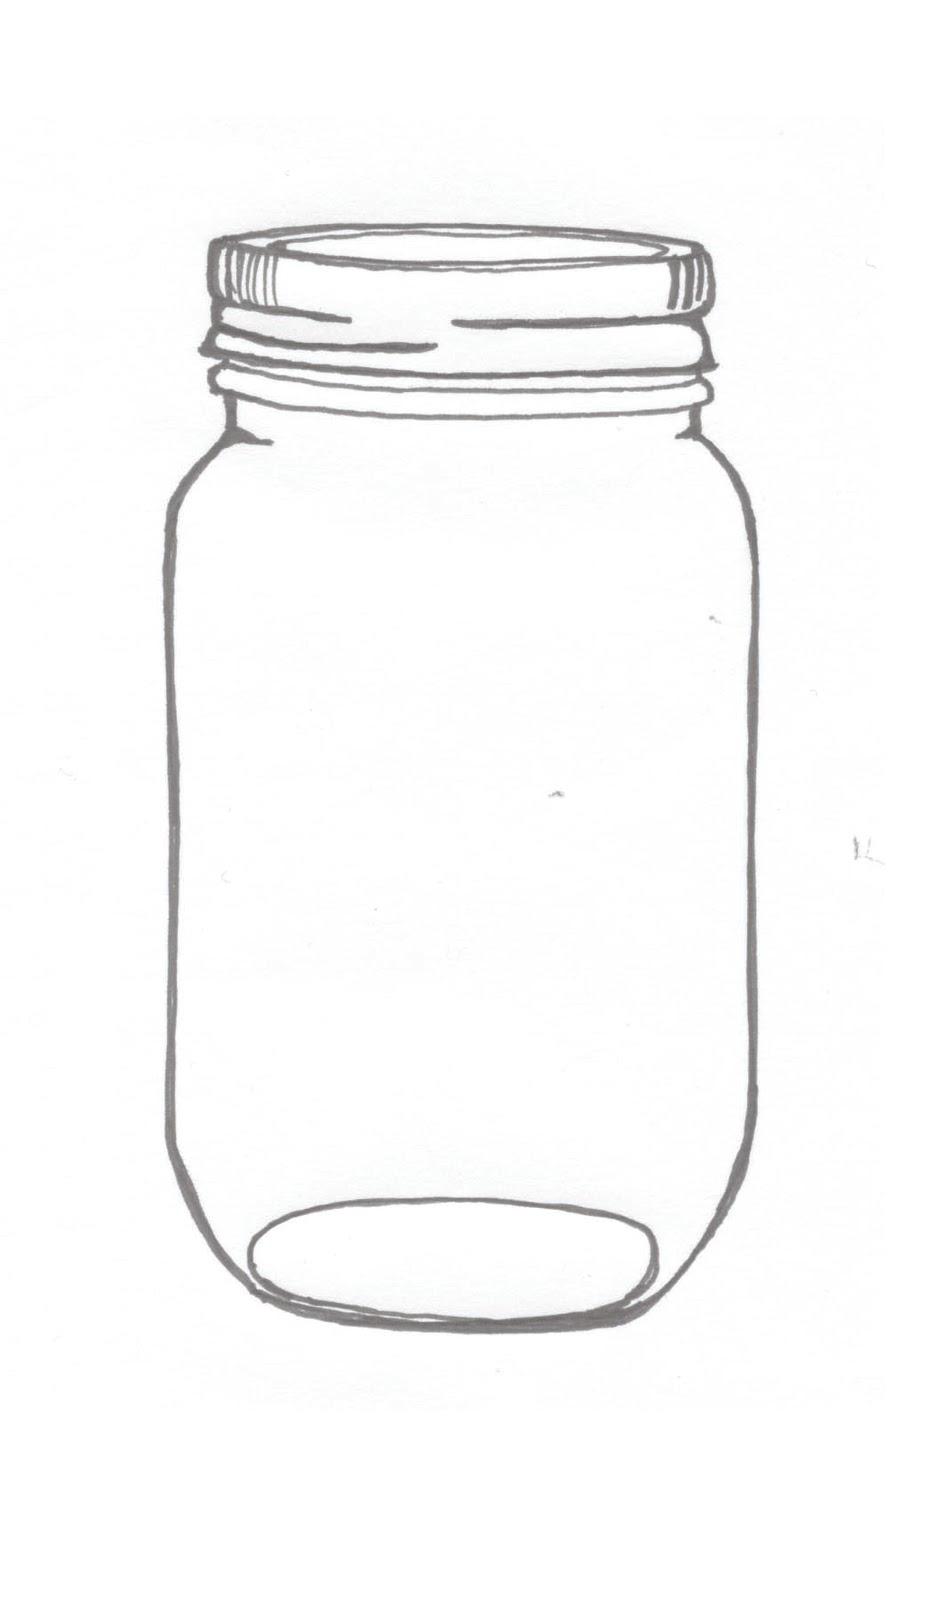 Free mason jar clipart vector library download Mason jar on mason jars clip art and free printable - Cliparting.com vector library download